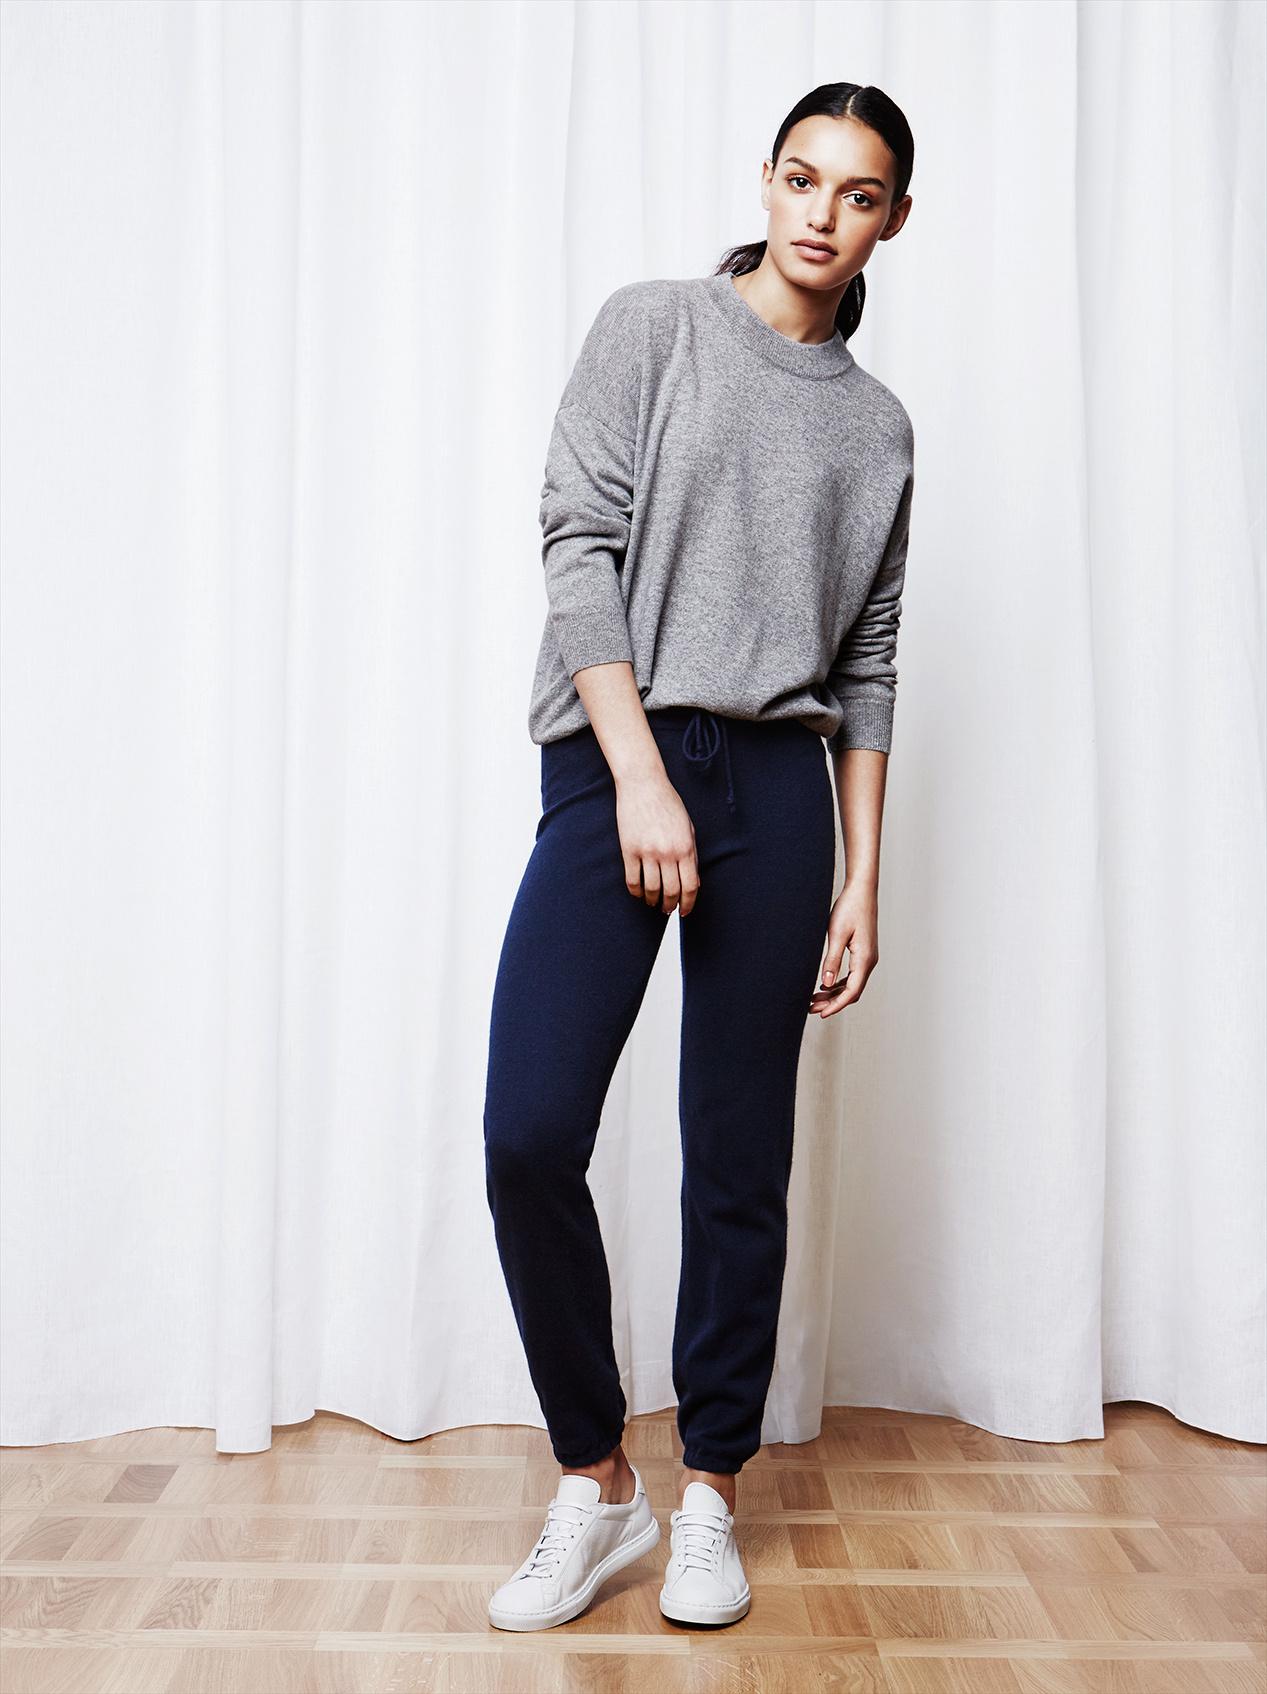 Soft Goat Women's Short Oversize Grey